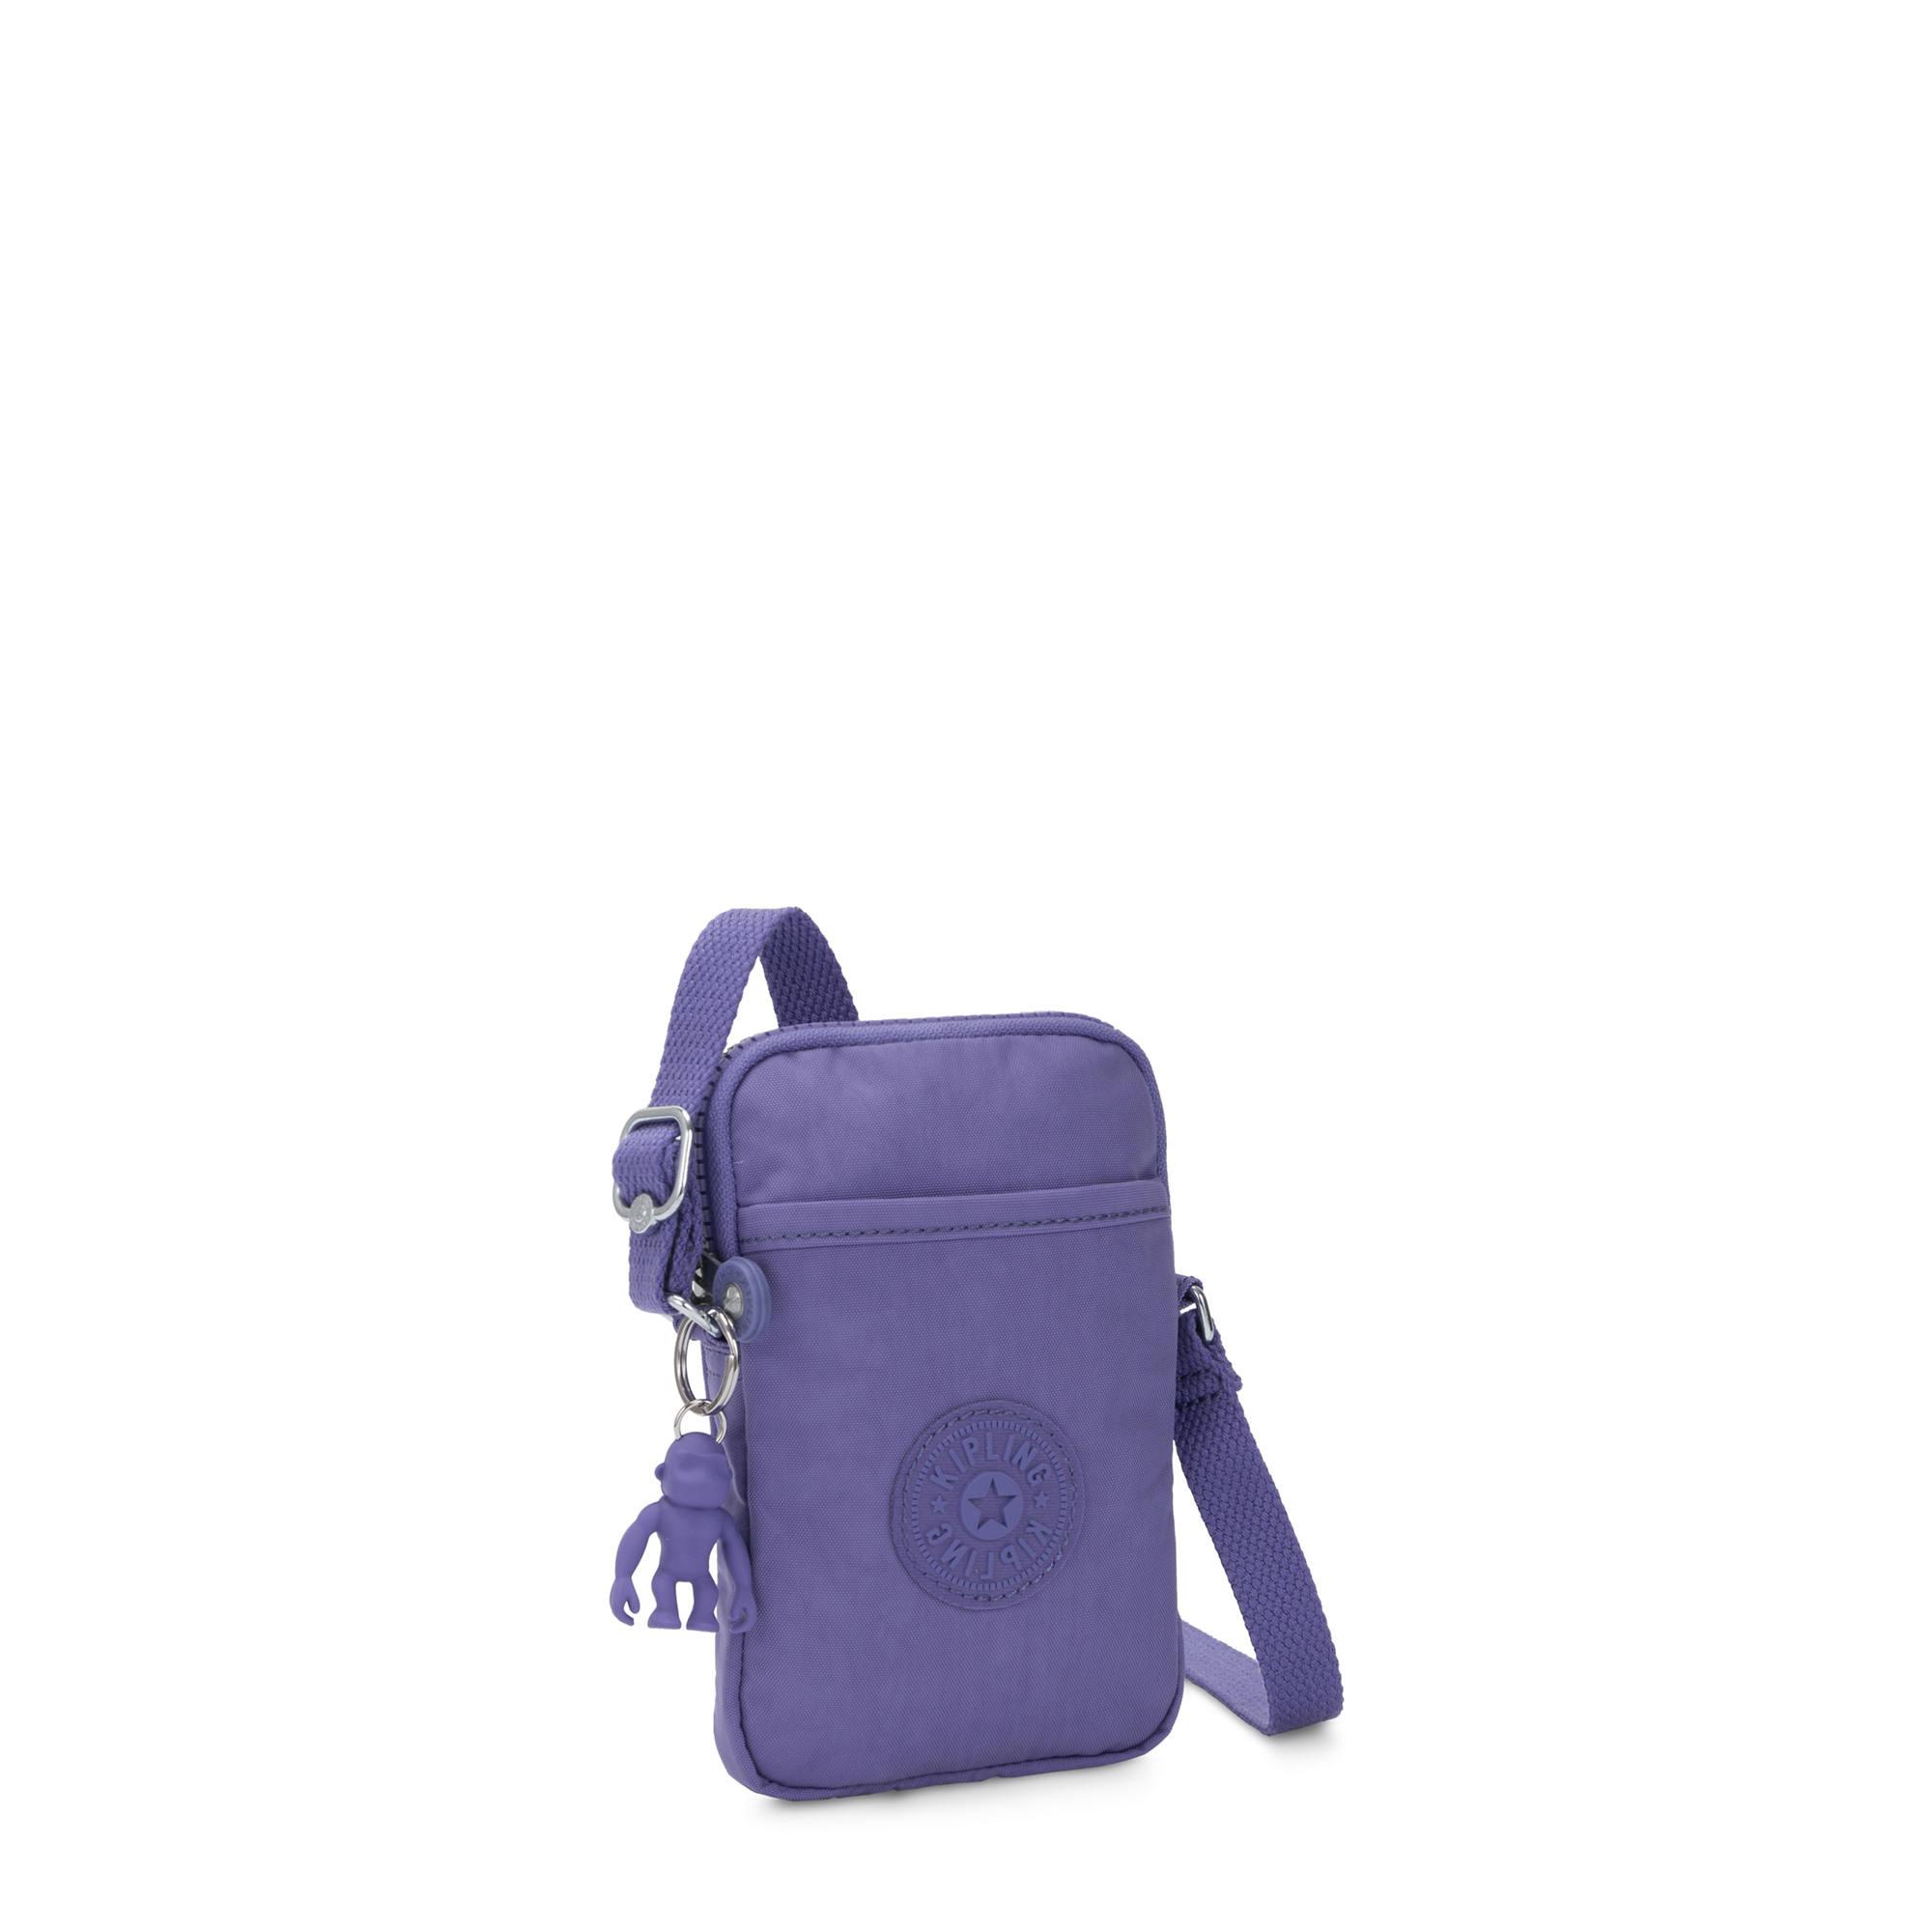 Tally Crossbody Phone Bag Kipling